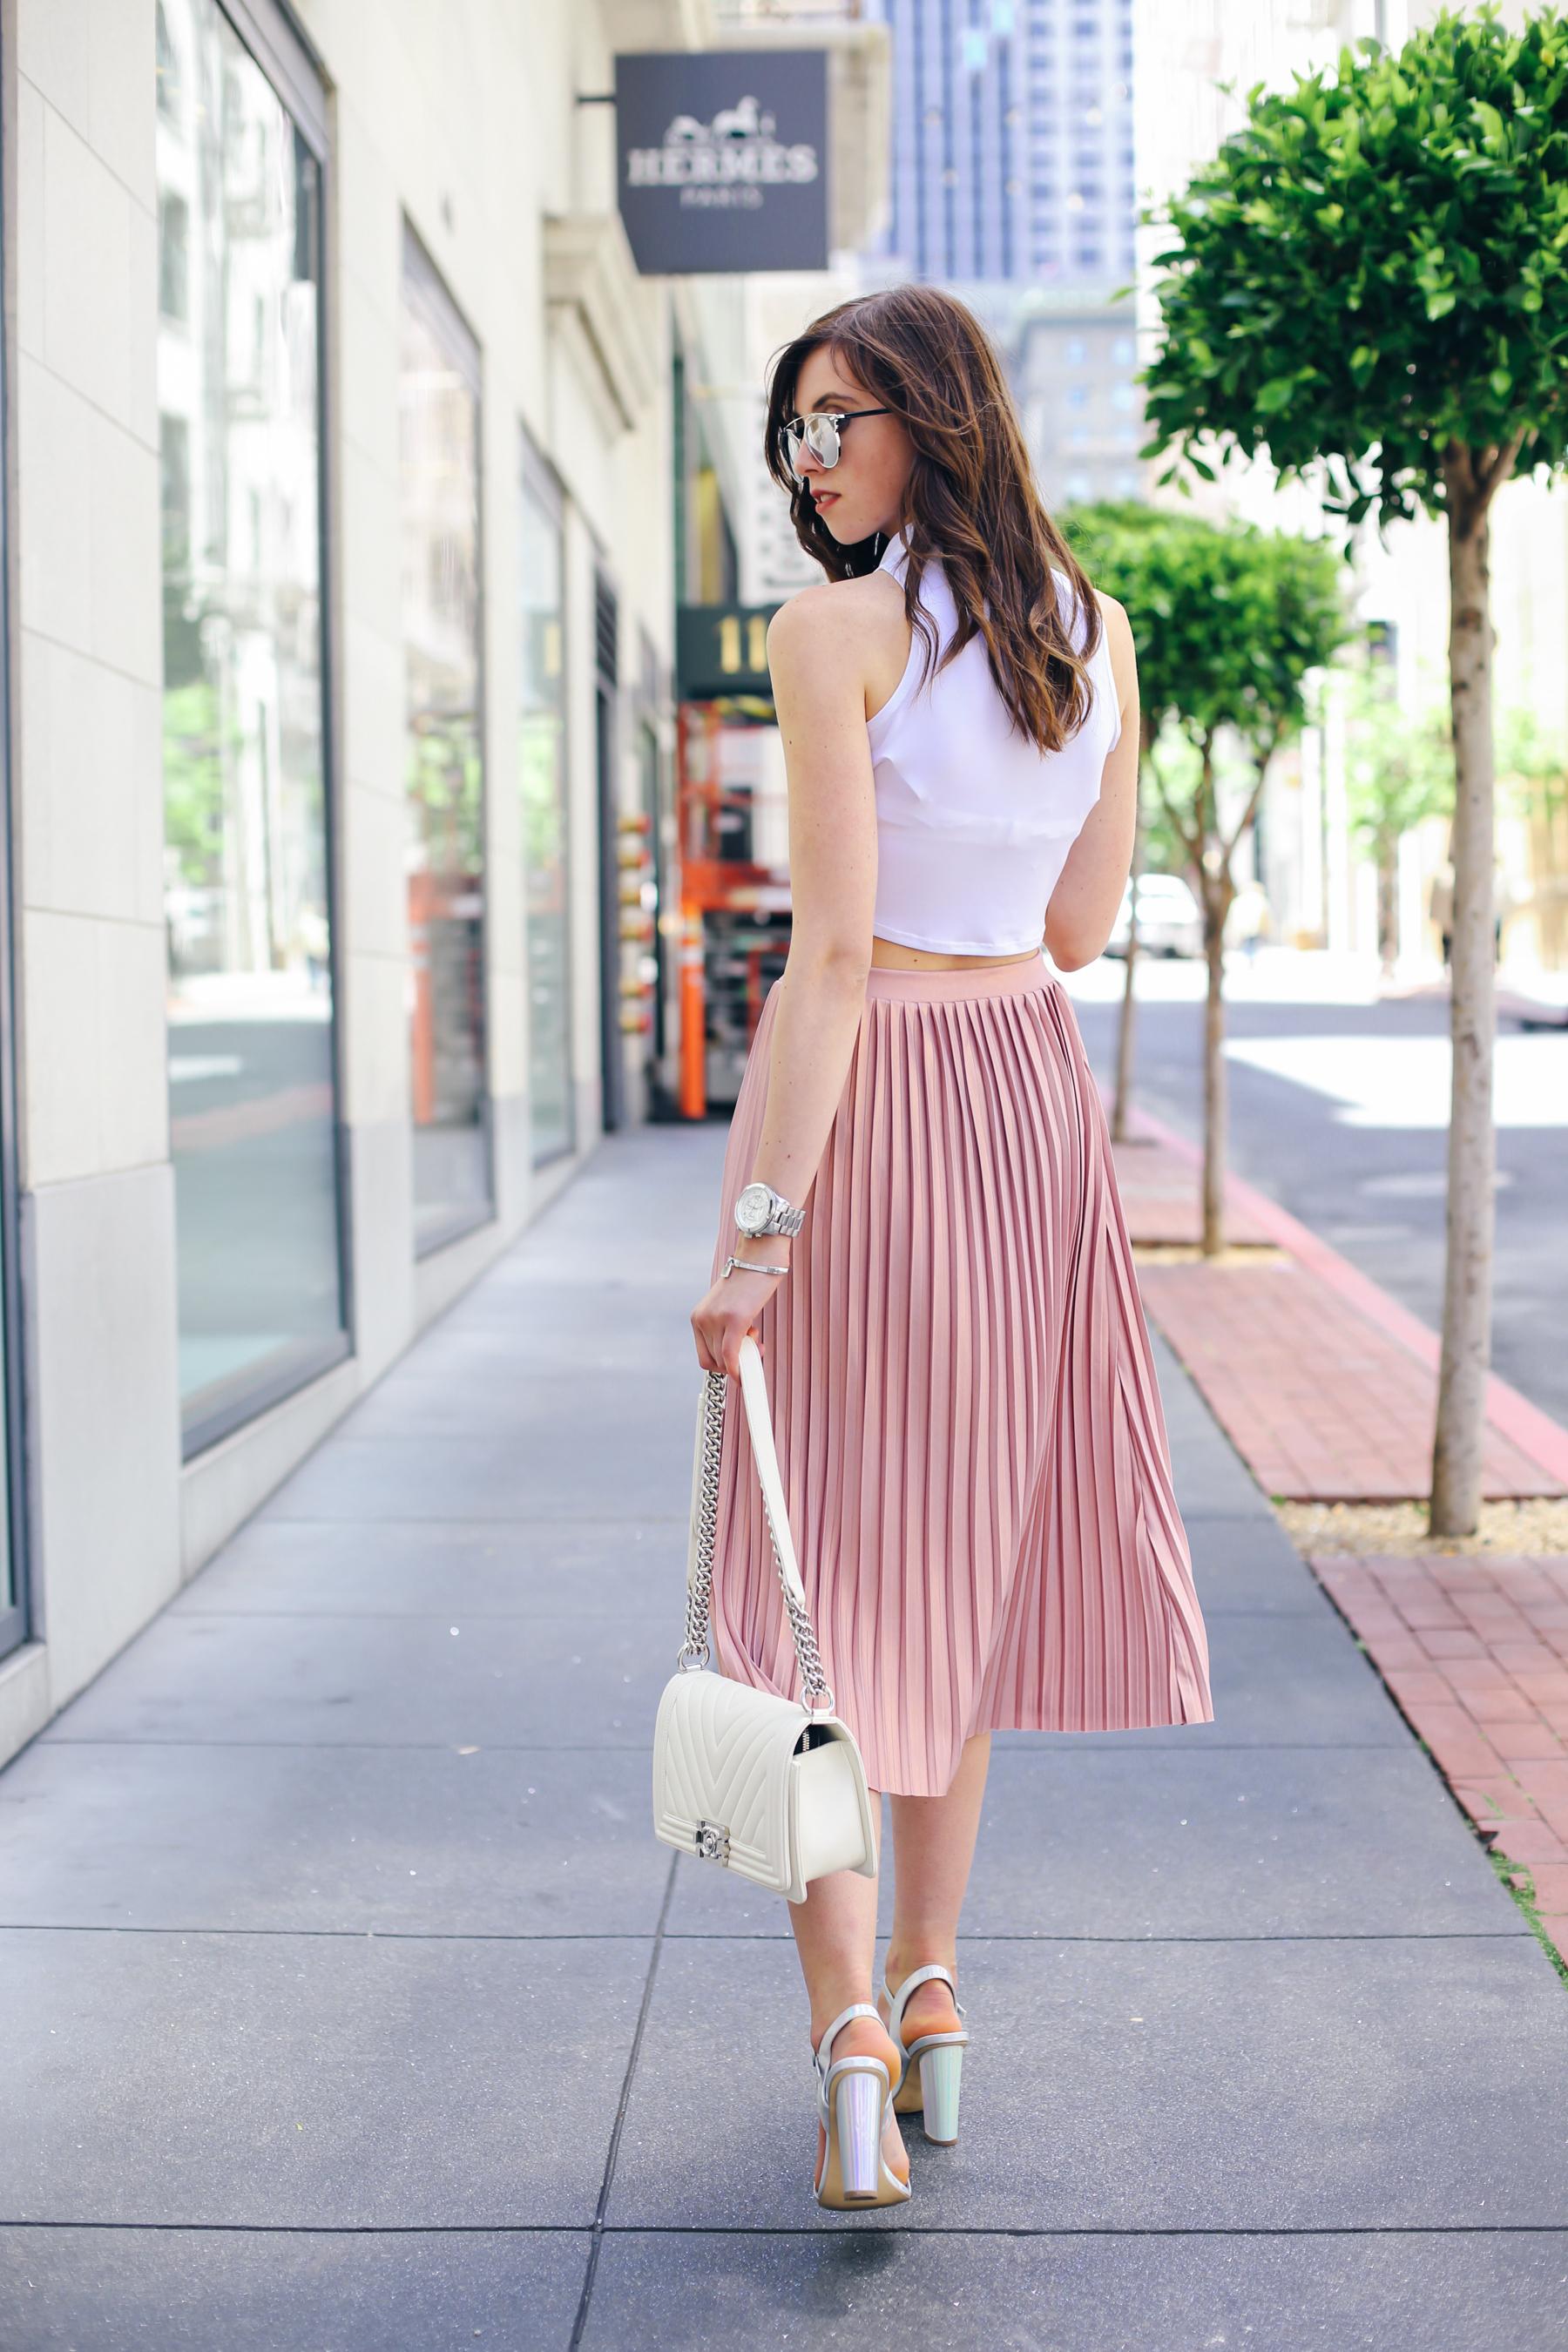 Barbora-Ondracova-FashioninmySoul-Fashion-Blogger-Photography-RyanbyRyanChua-7550